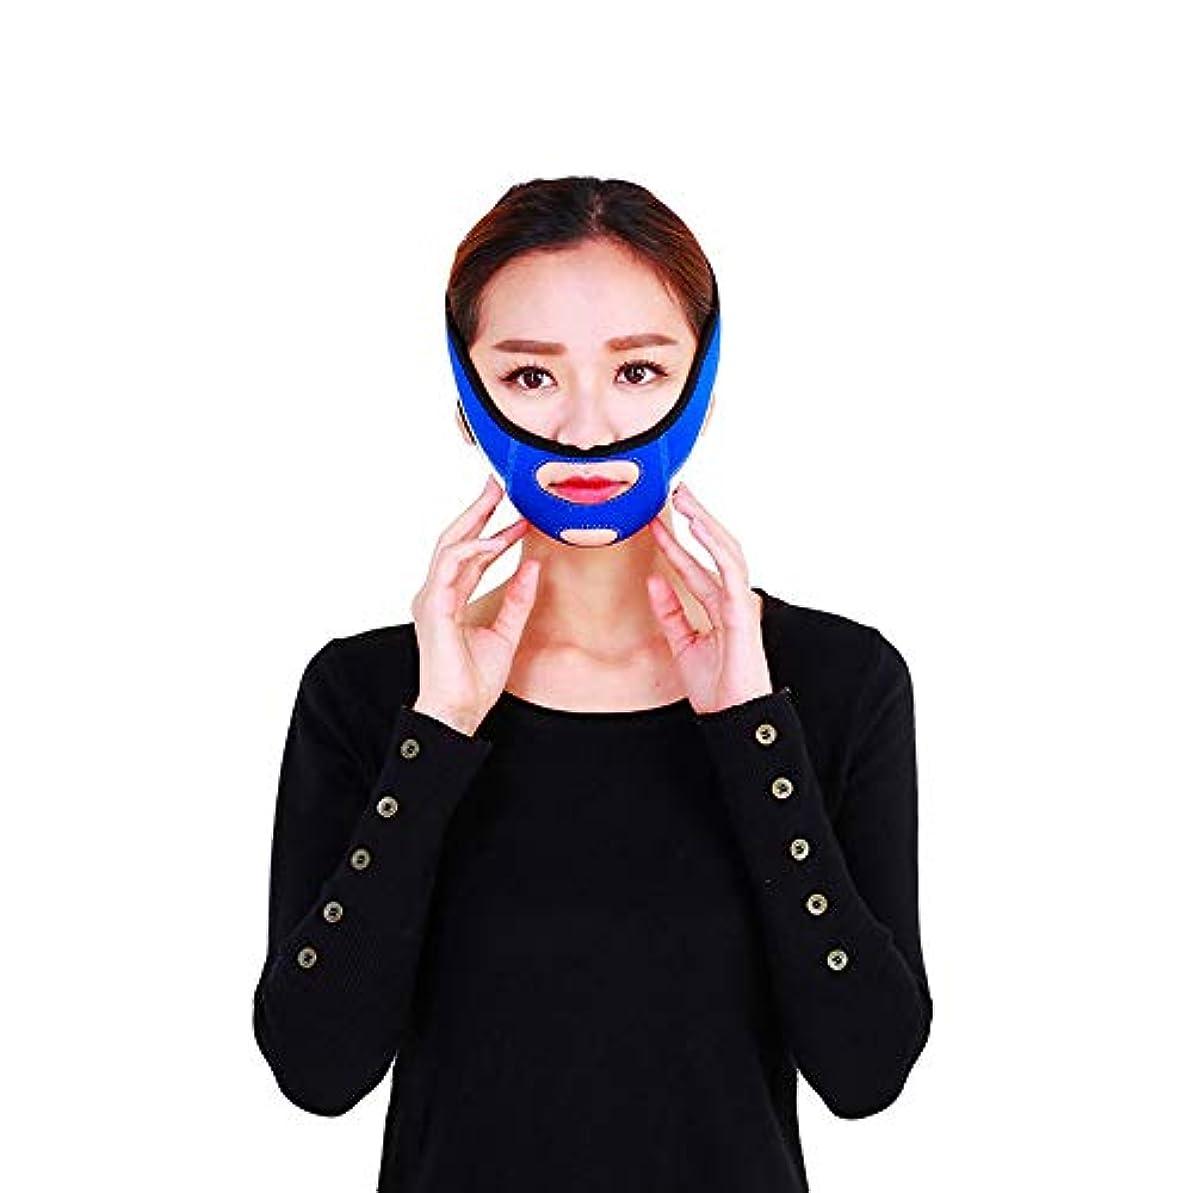 XINGZHE フェイシャルリフティング痩身ベルトフェーススリム二重あごを取り除くアンチエイジングリンクルフェイス包帯マスク整形マスクが顔を引き締める フェイスリフティングベルト